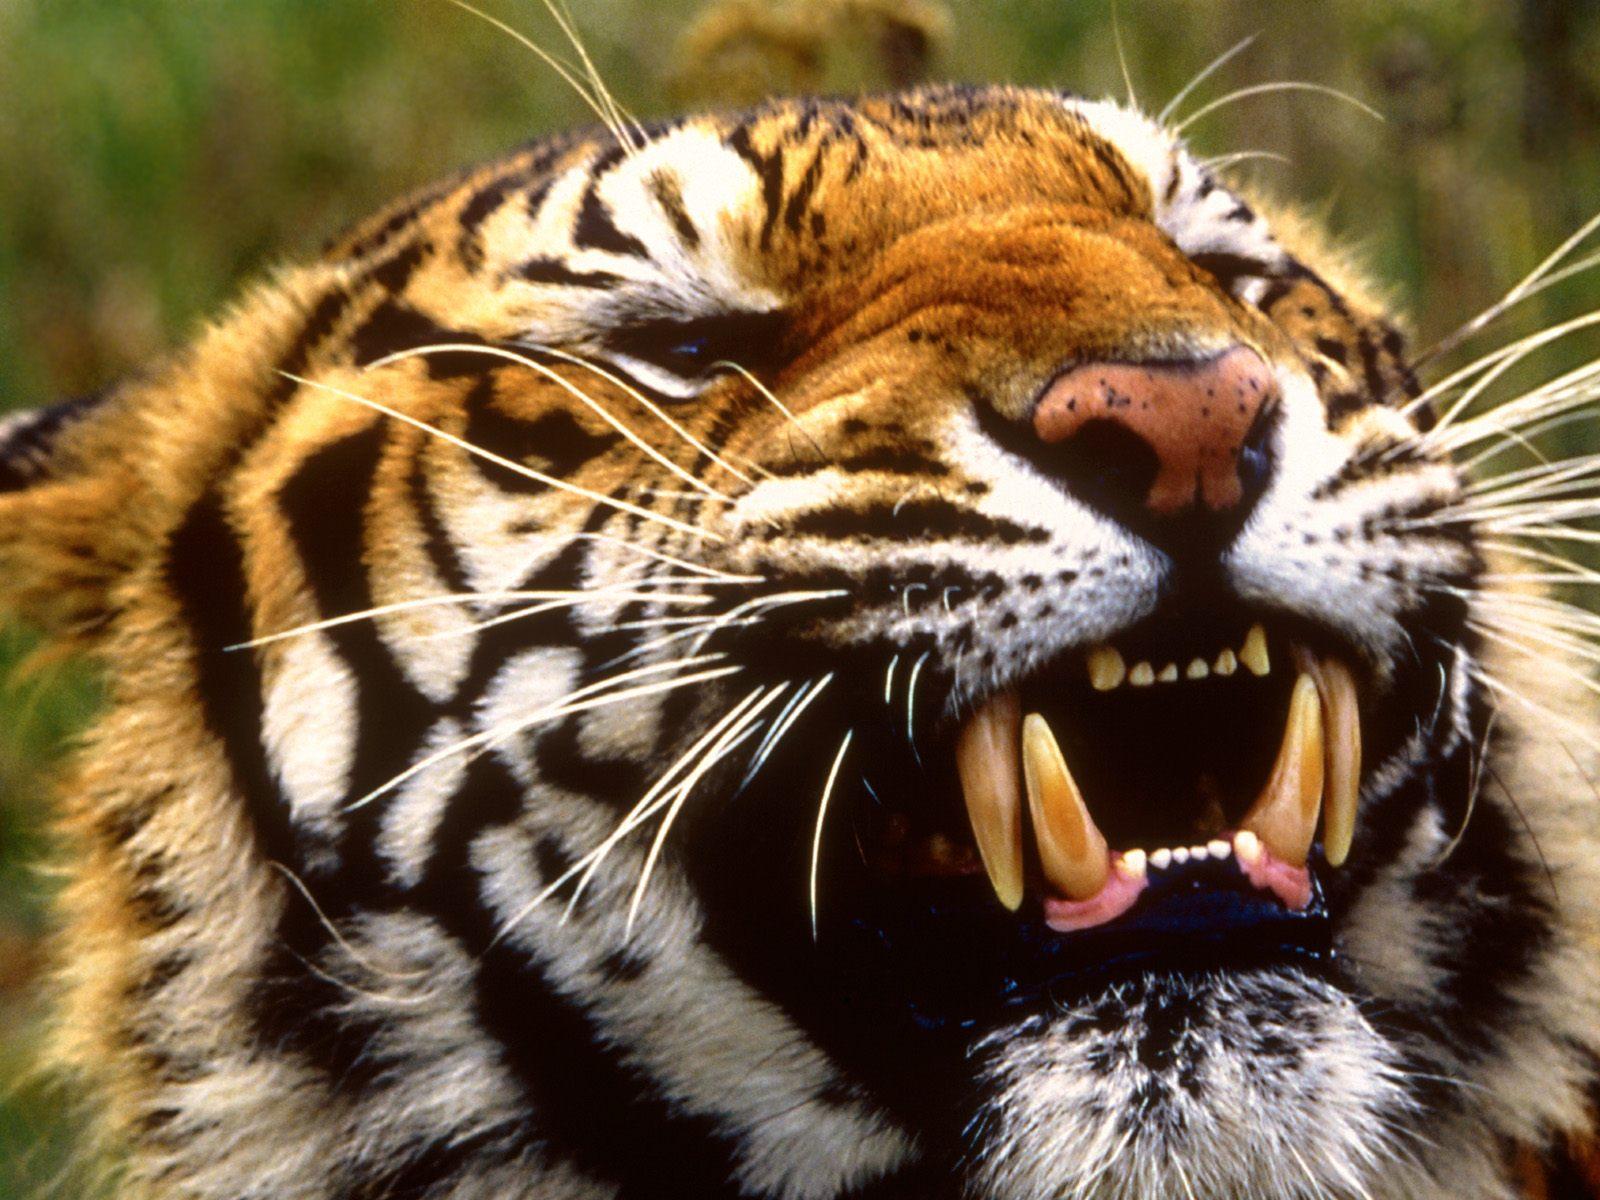 Tigers HD Wallpapers Tiger Wallpaper for Desktop Backgrounds 1600x1200